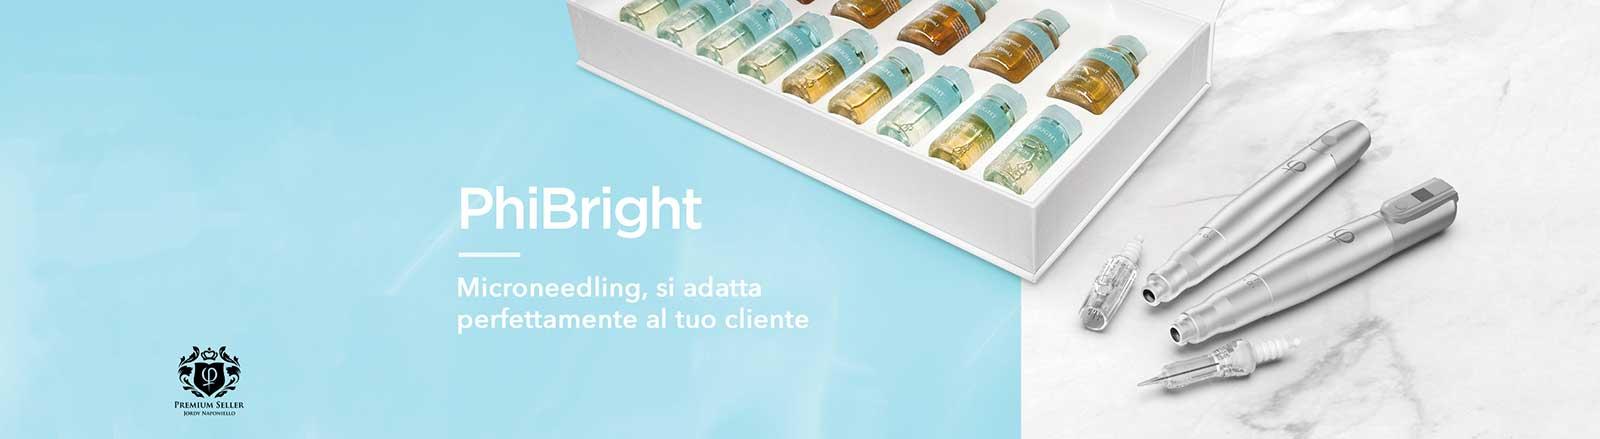 phibright-1